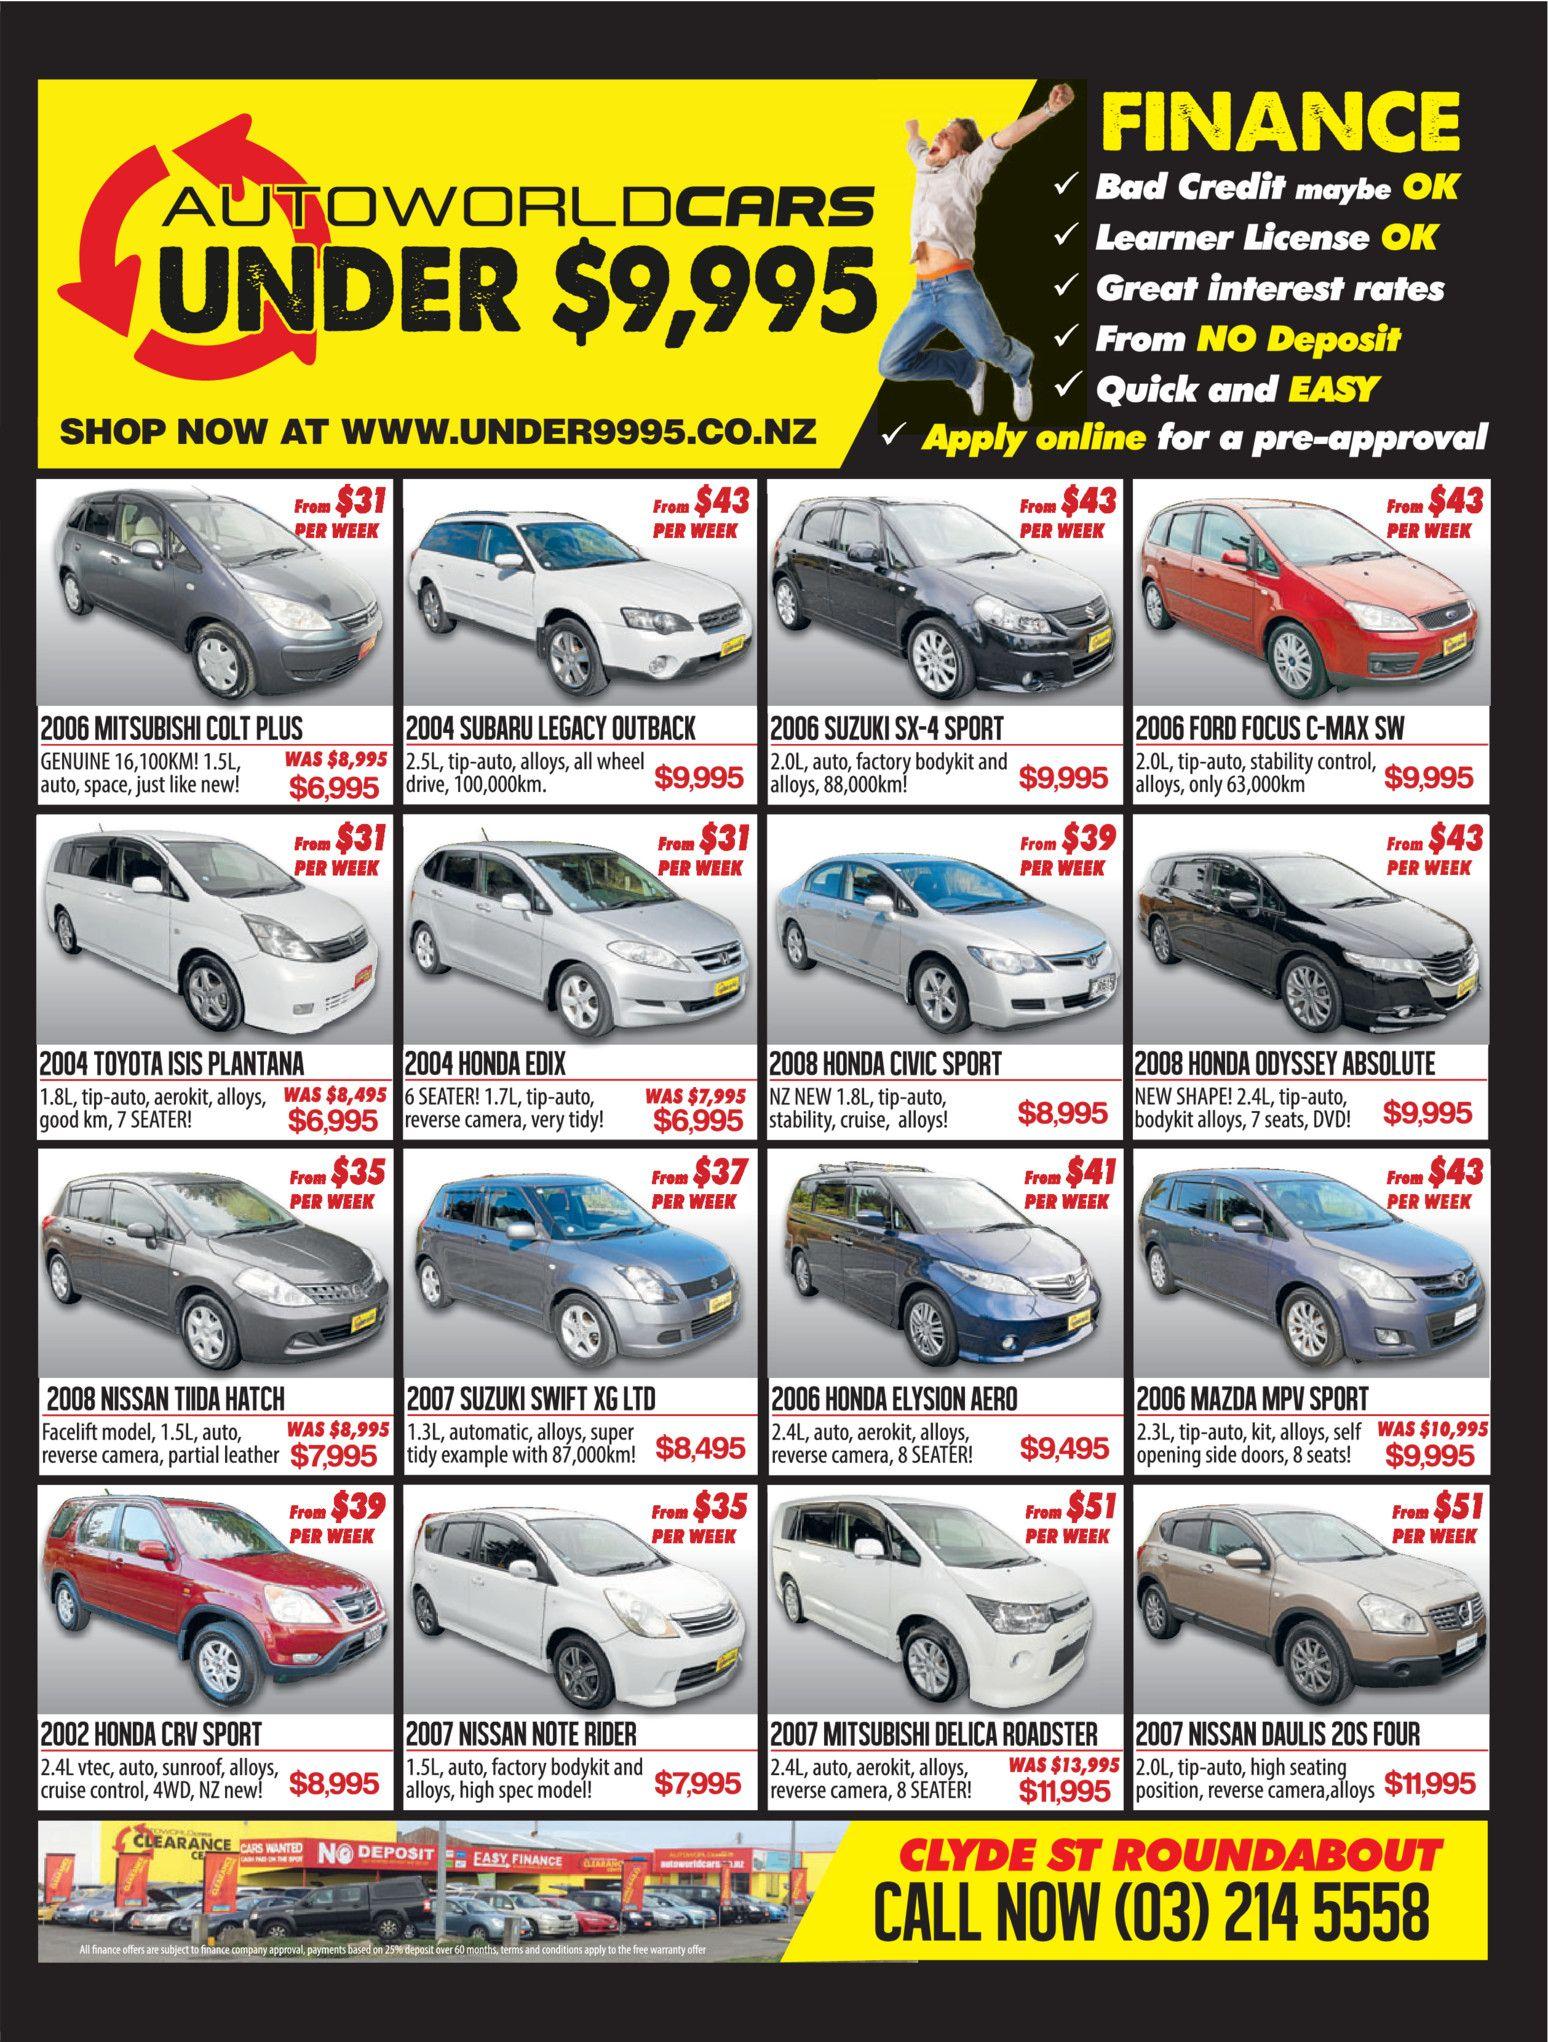 2002 Honda Crv 2002 Crv Cruise Control Unsolvable Problem